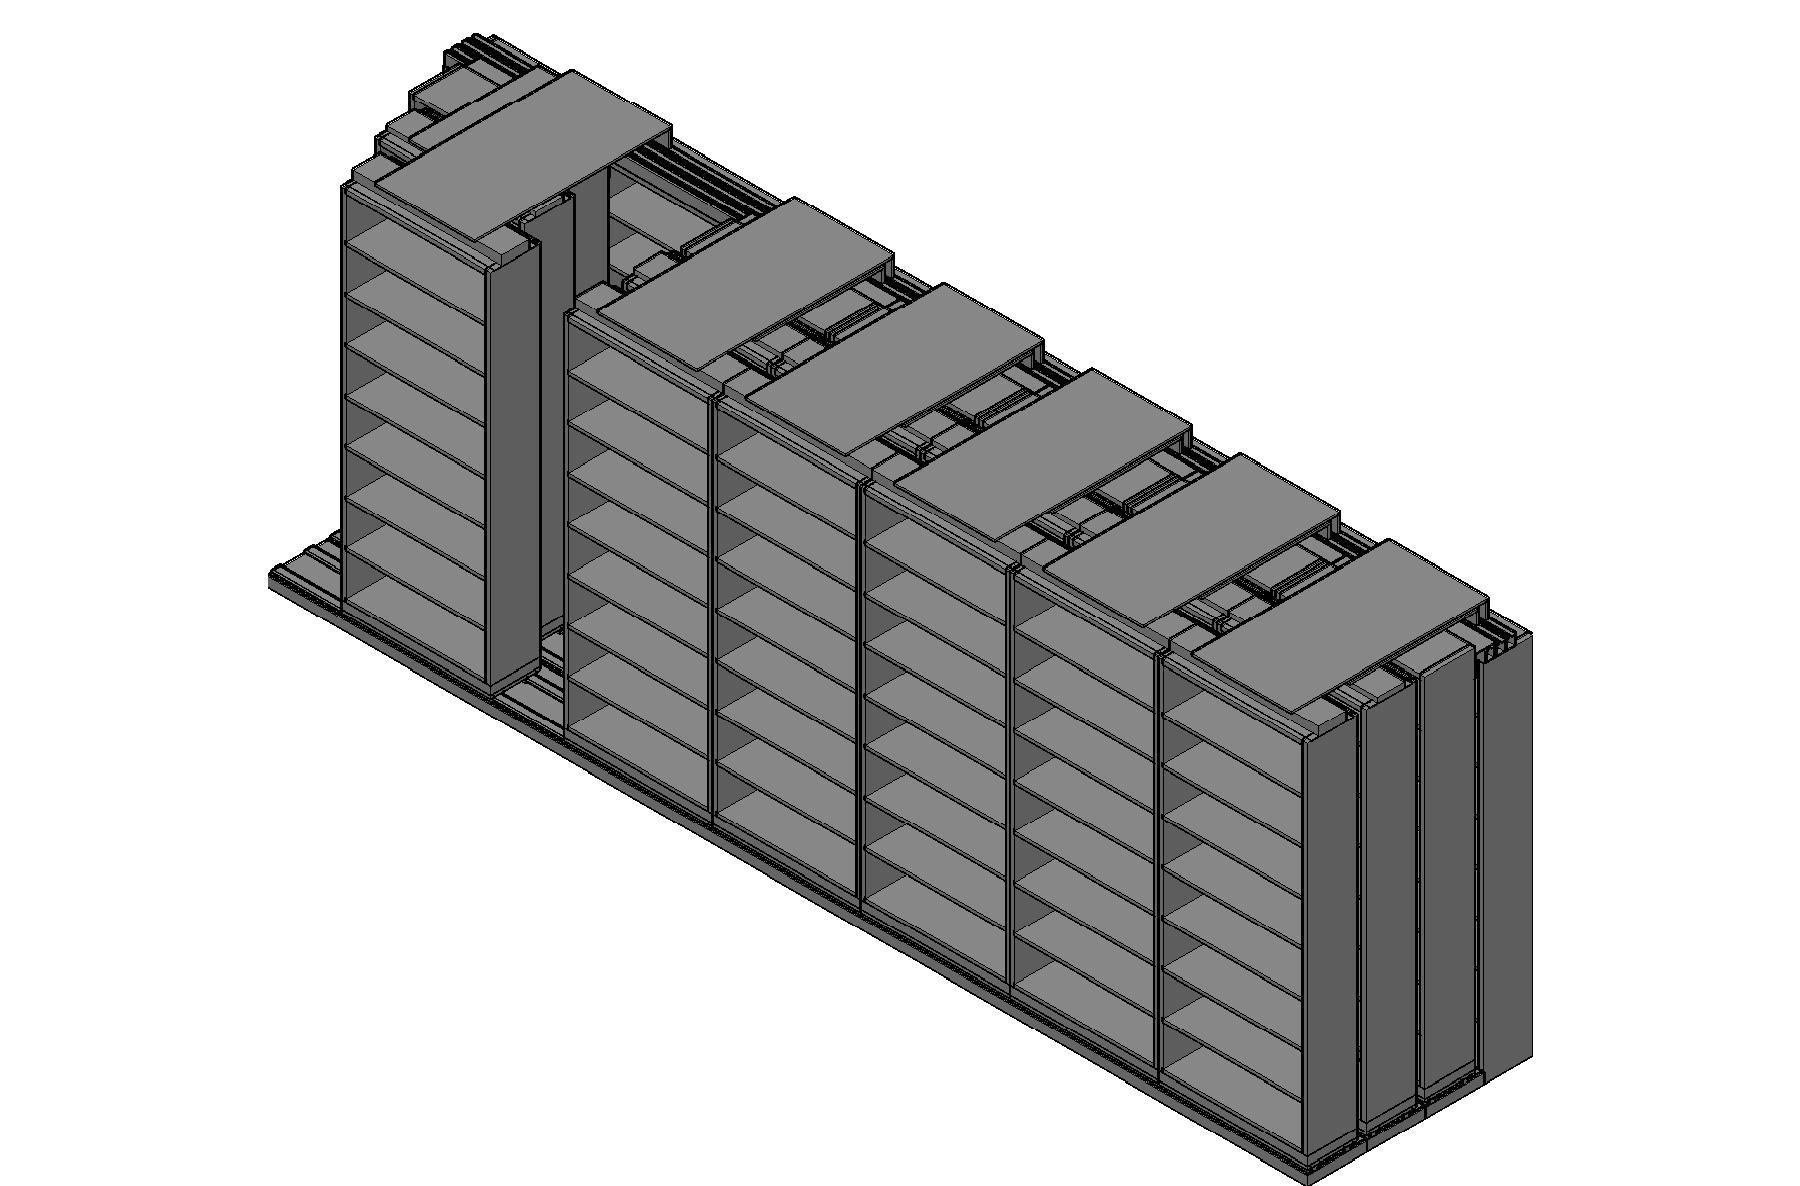 "Letter Size Sliding Shelves - 4 Rows Deep - 8 Levels - (36"" x 12"" Shelves) - 256"" Total Width"